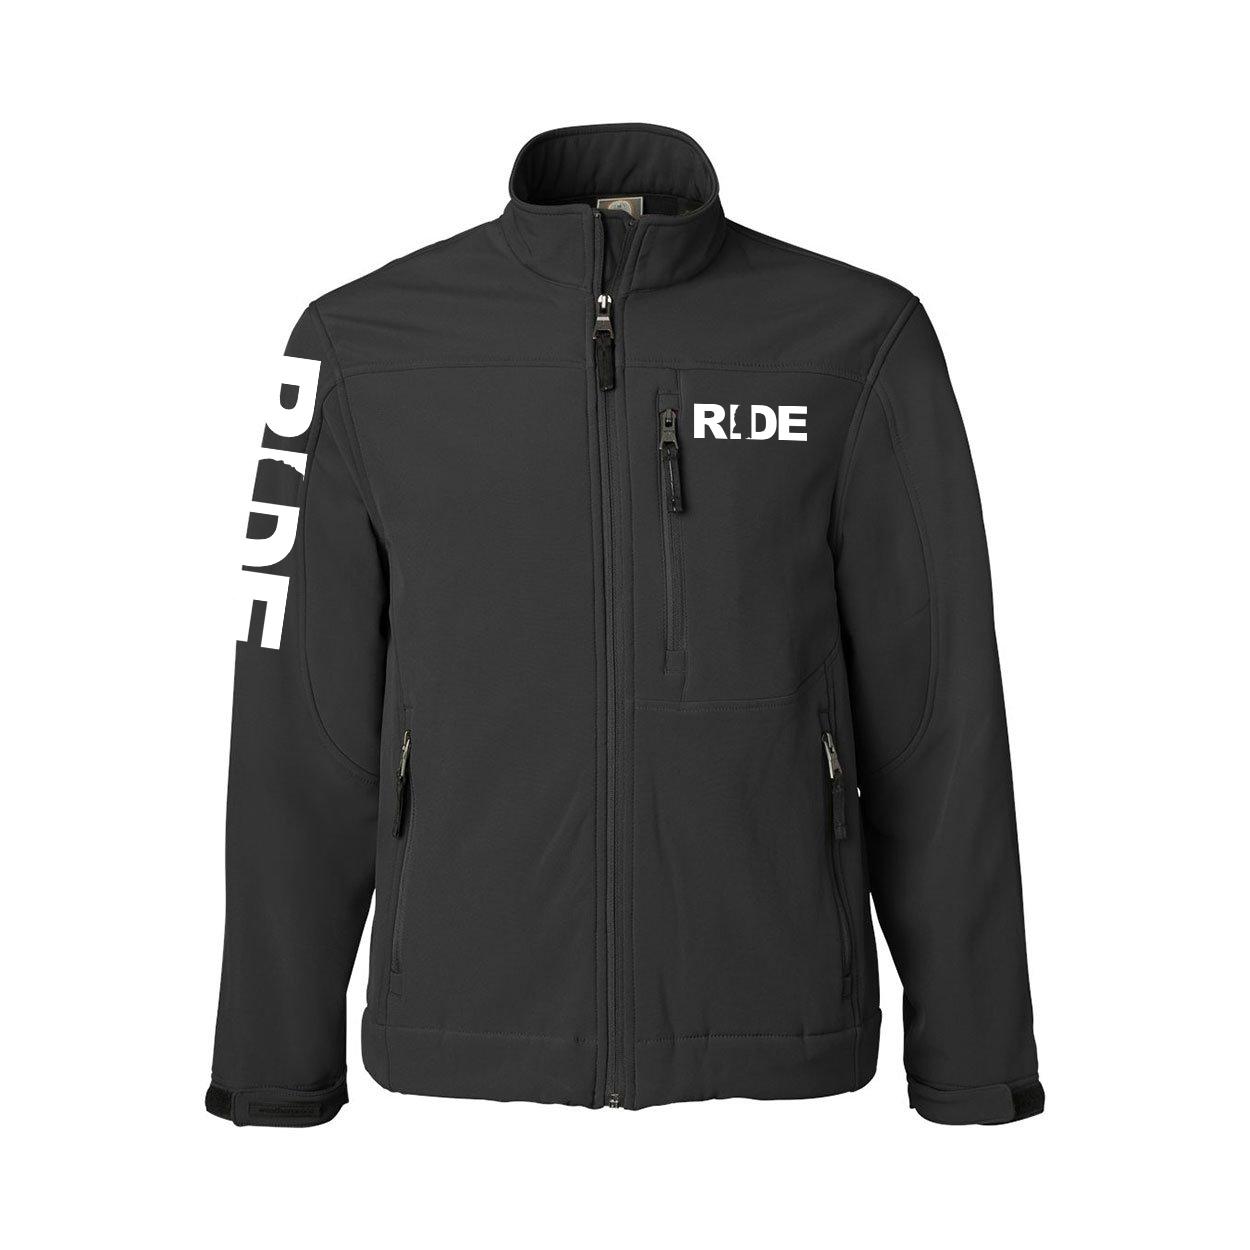 Ride Mississippi Classic Soft Shell Weatherproof Jacket (White Logo)